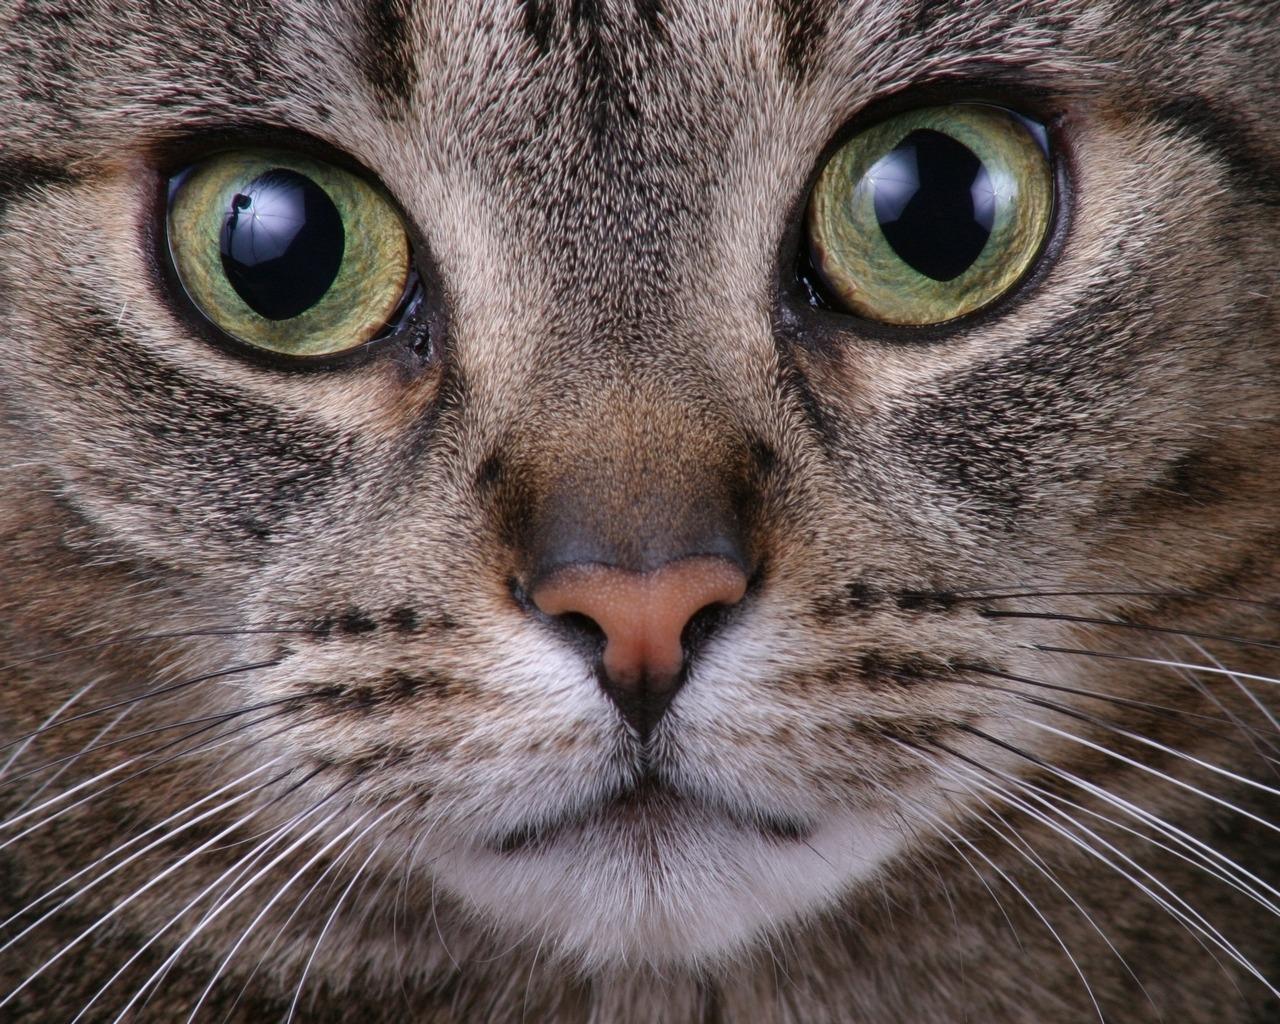 /var/www/html/wp-content/uploads/2018/08/mirada-felina-curiosa-1